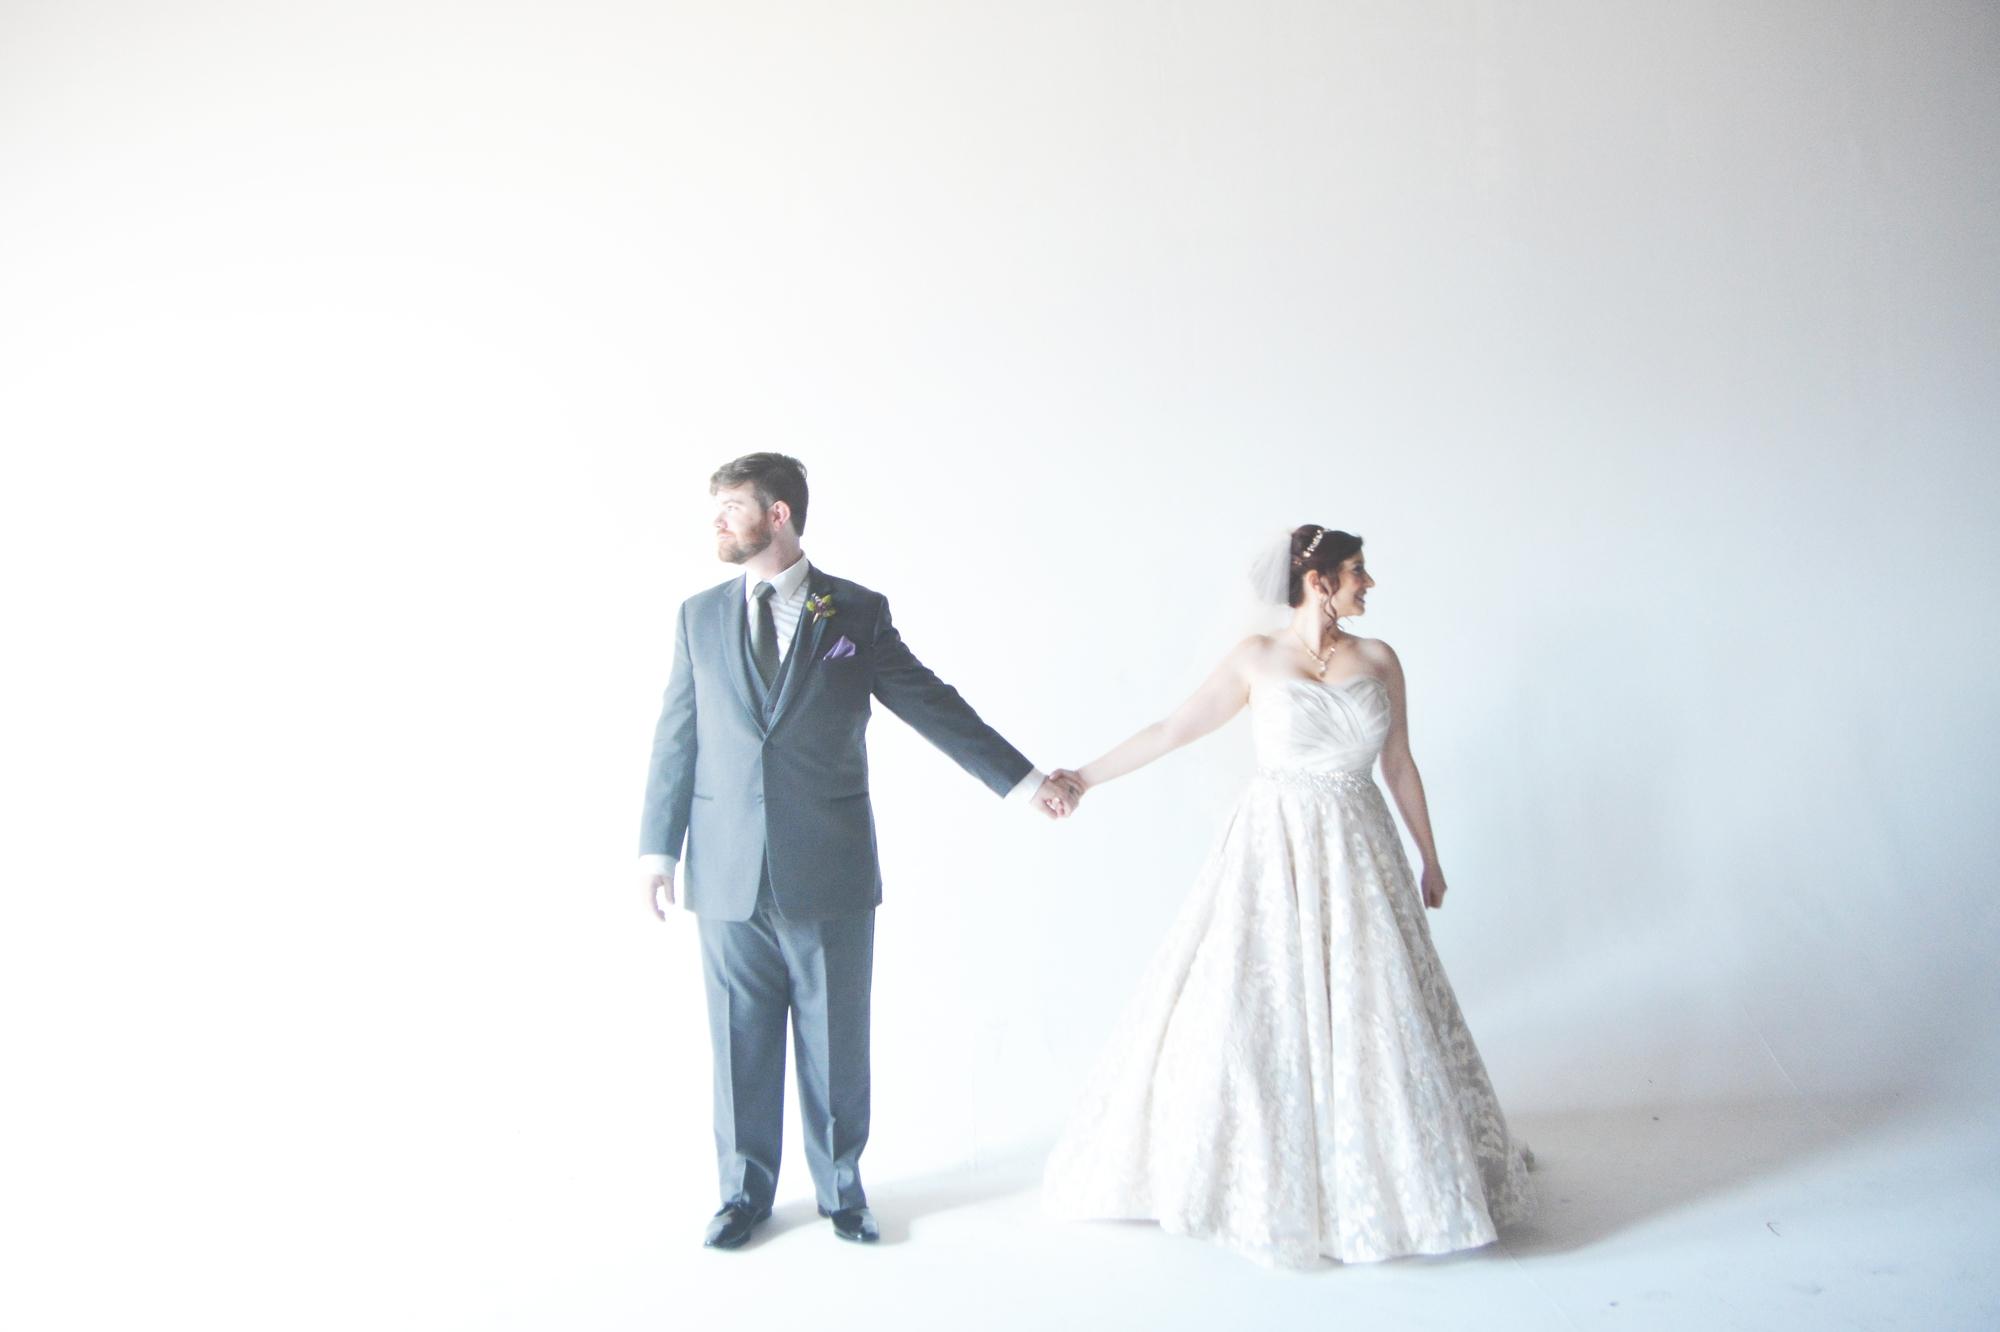 ambient-studio-wedding-photography-six-hearts-photography005